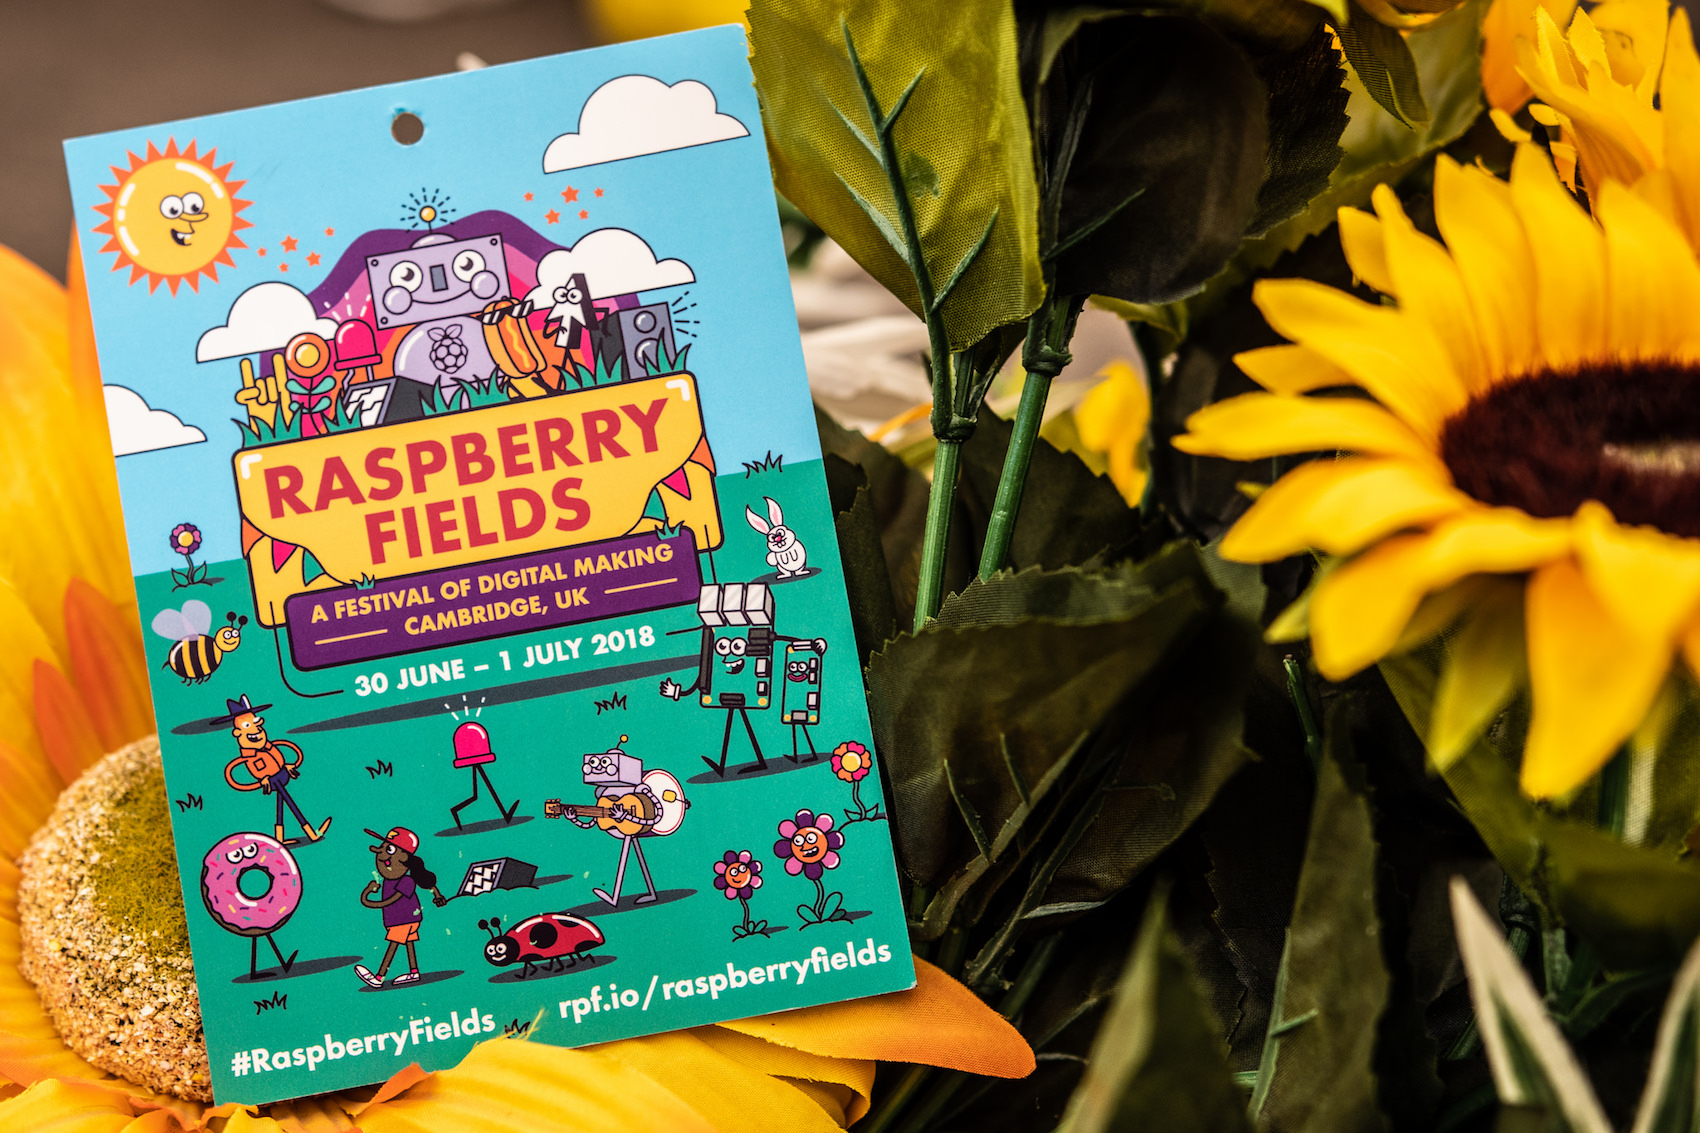 Raspberry Fields 2018: ice cream, robots, and coding